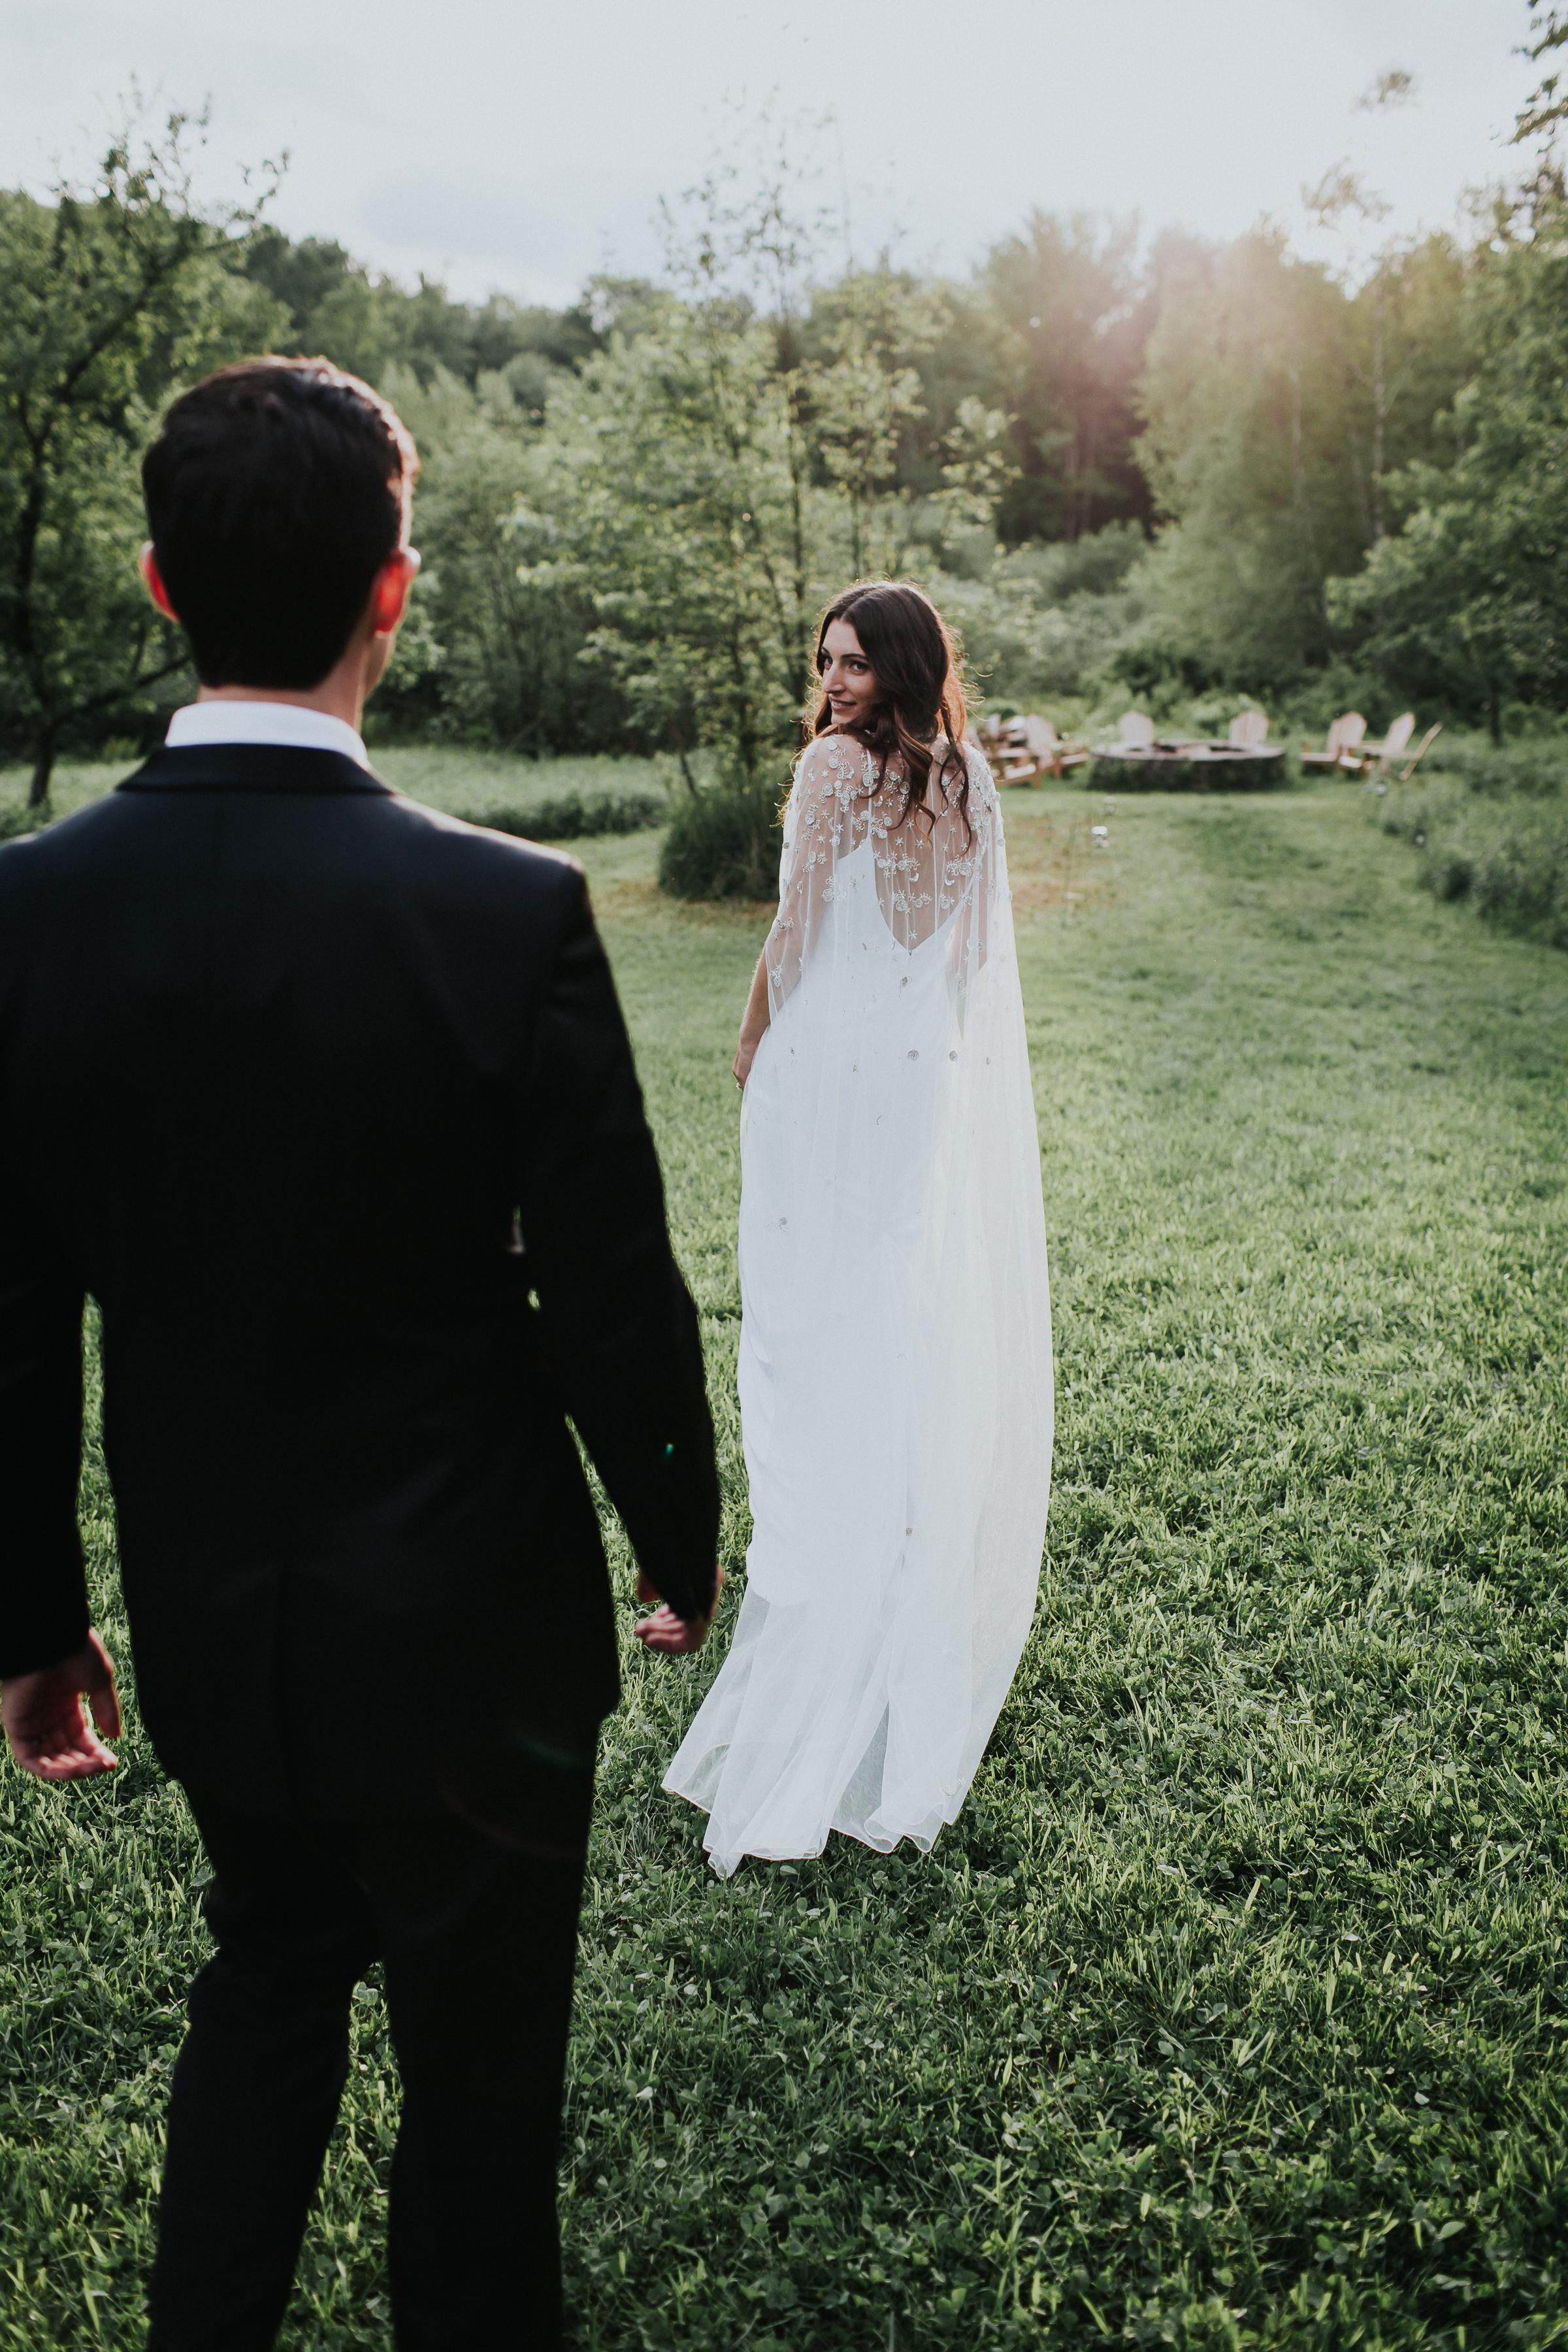 Handsome-Hollow-Long-Eddy-Catskills-New-York-Fine-Art-Documentary-Wedding-Photographer-121.jpg